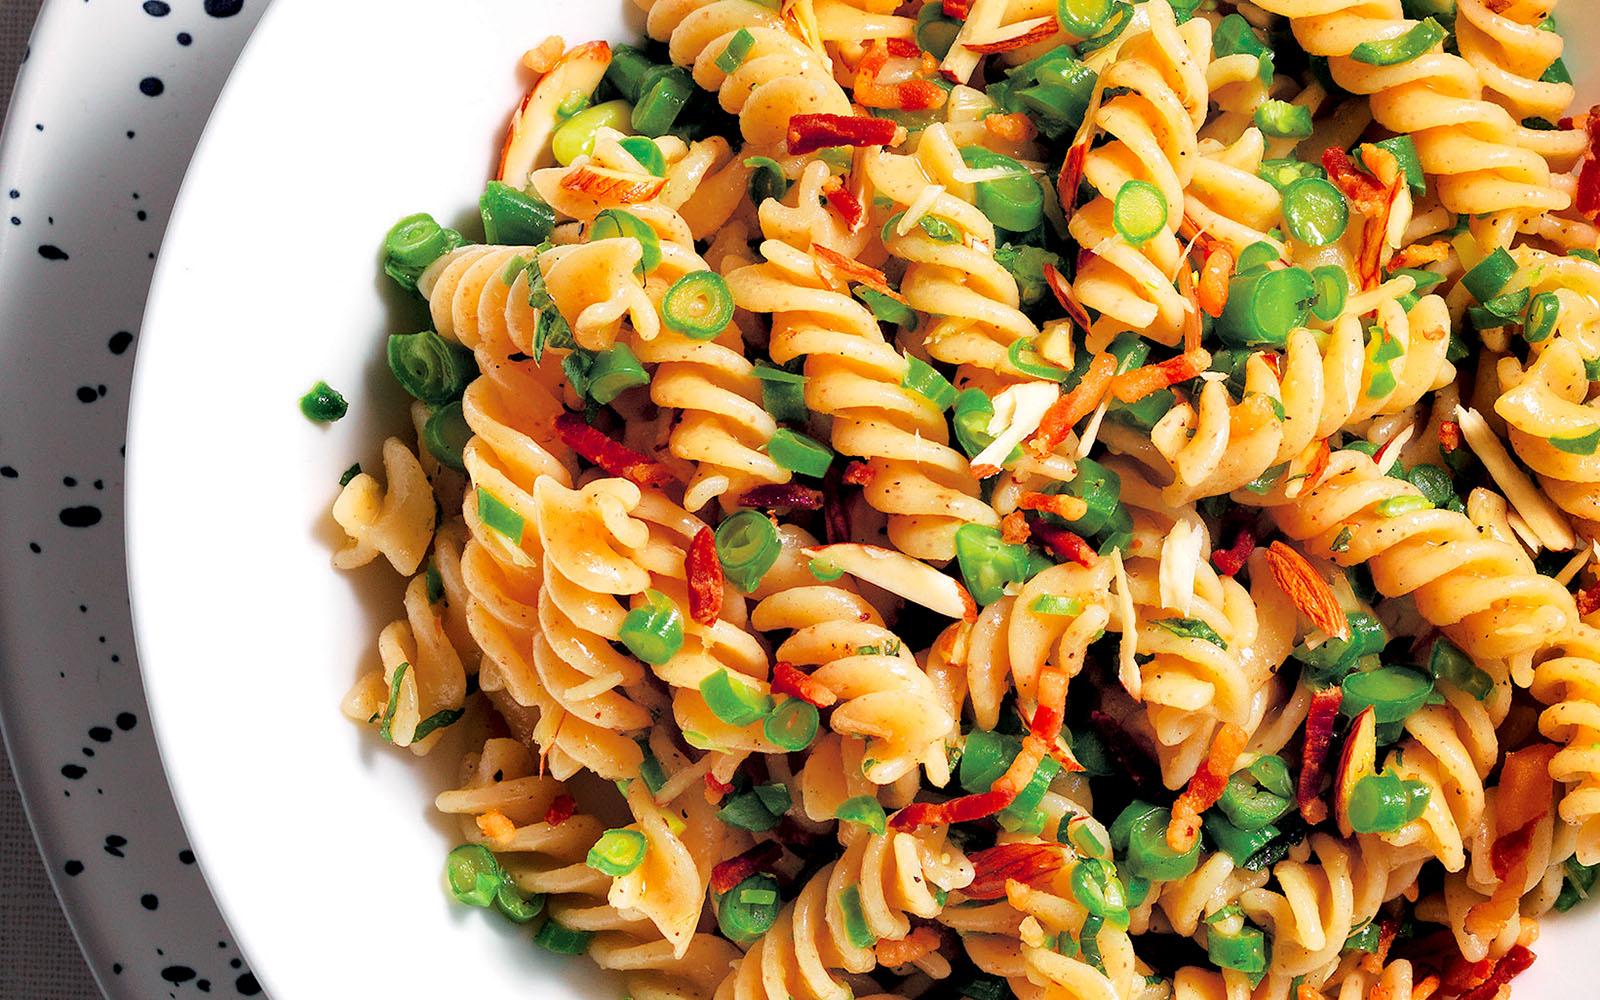 Fusilli salad